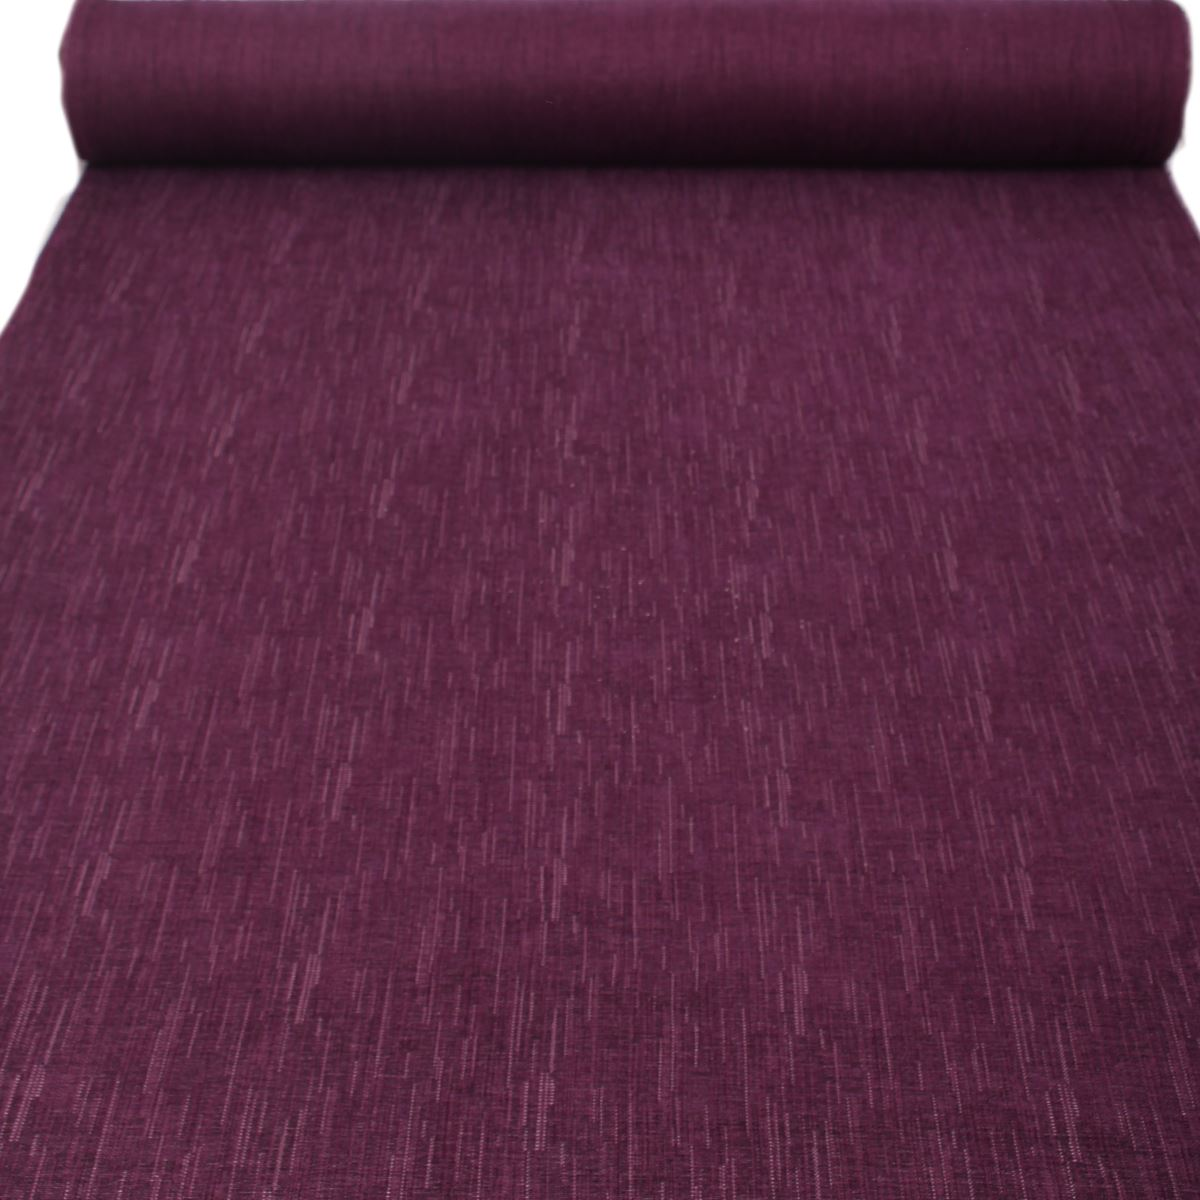 034-Chenille-034-Slubbed-Shabby-Worn-Look-Curtain-Cushion-Sofa-Upholstery-Fabric thumbnail 44